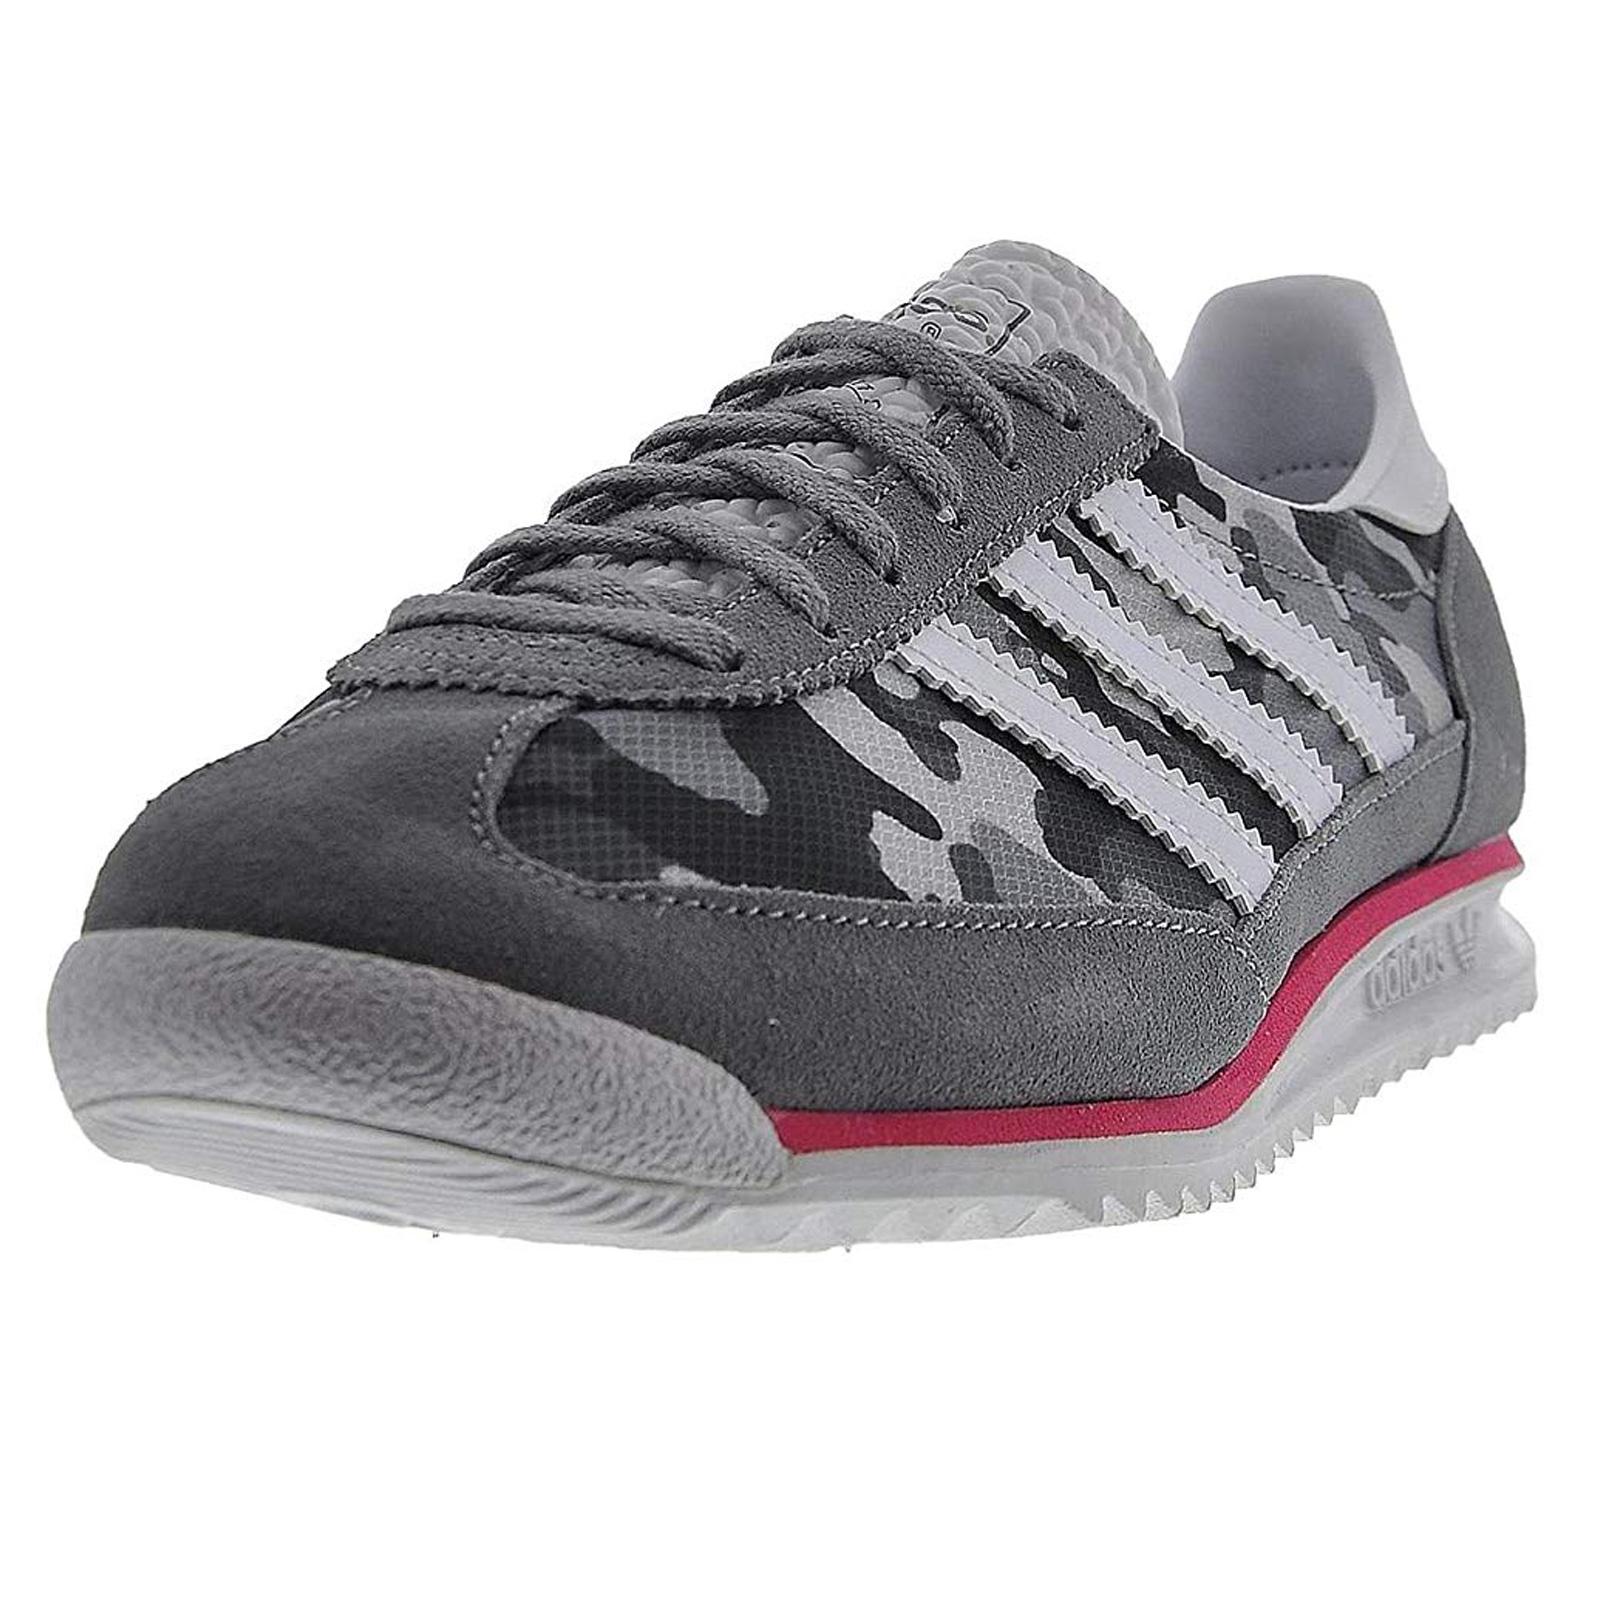 Details zu adidas Retro SL 72 Retro Sneaker Vintage Spezial Schuhe Grau Camouflage 40 23